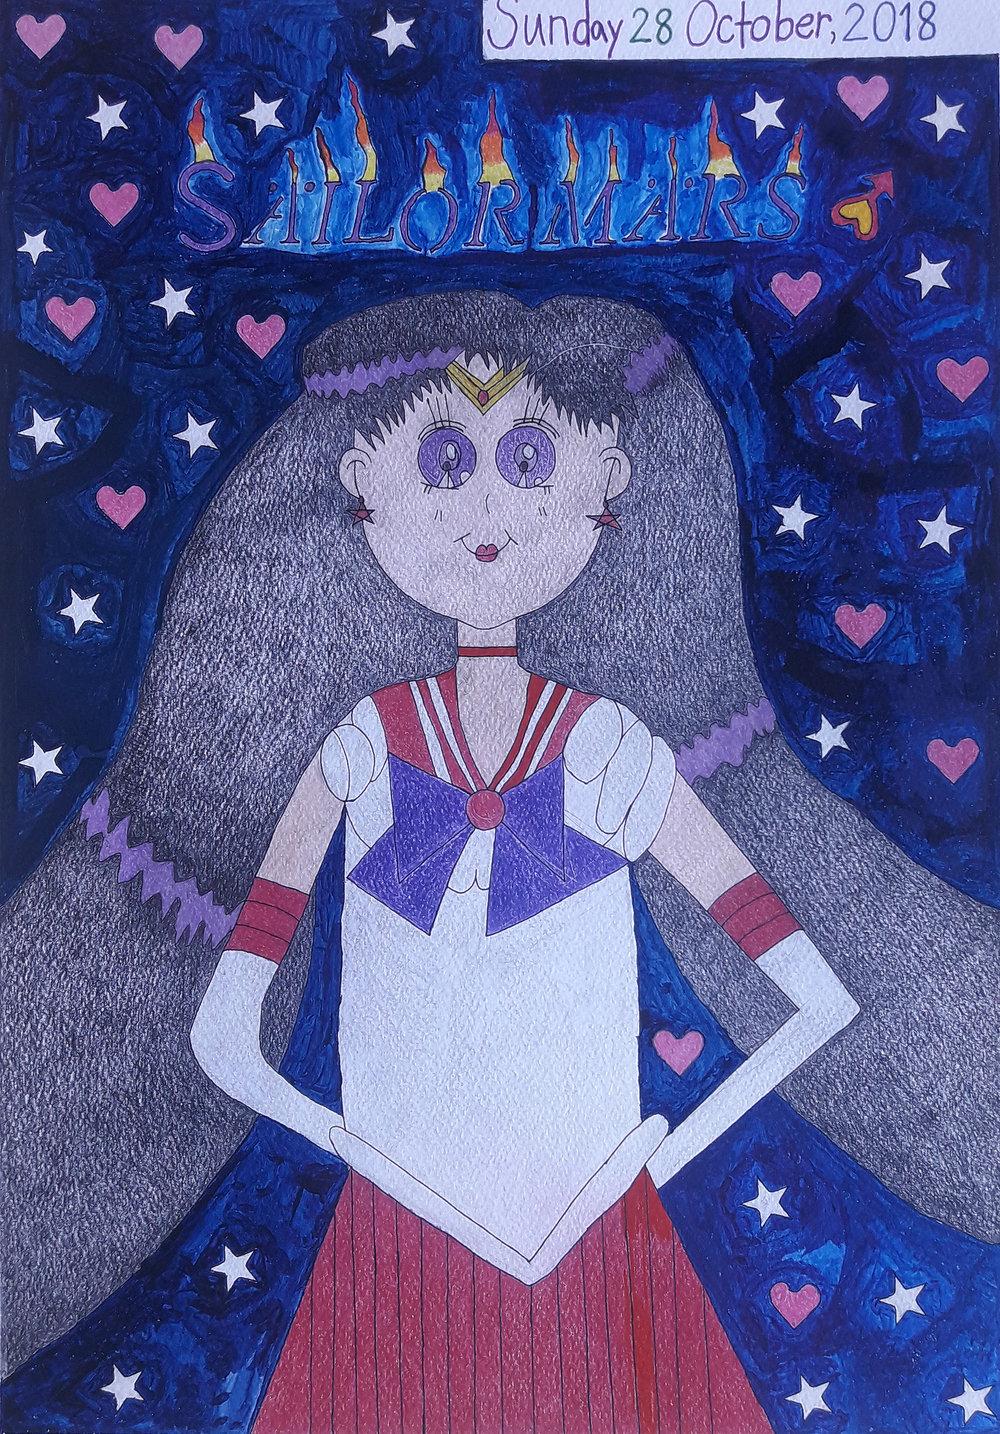 Callie Hunter - Sailor Mars.jpg